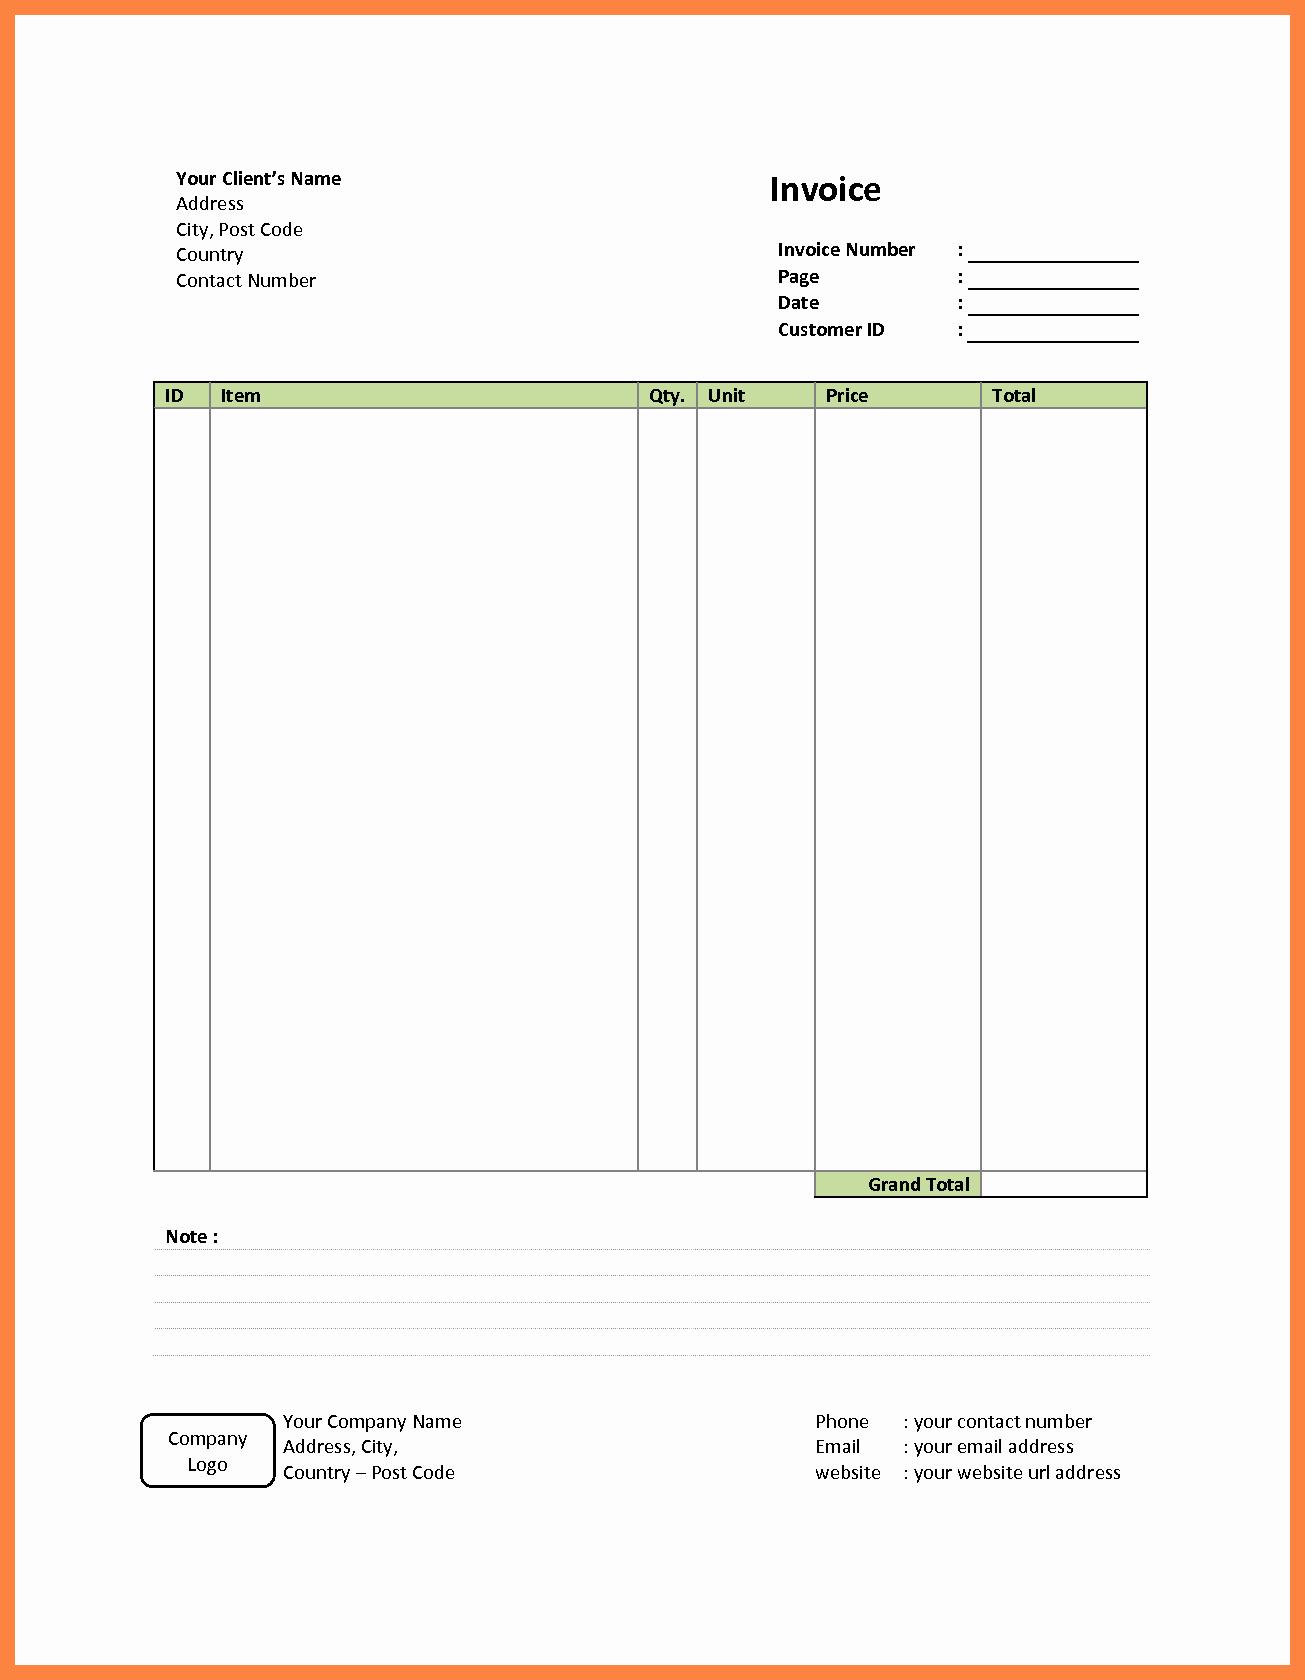 Get Invoice Simple